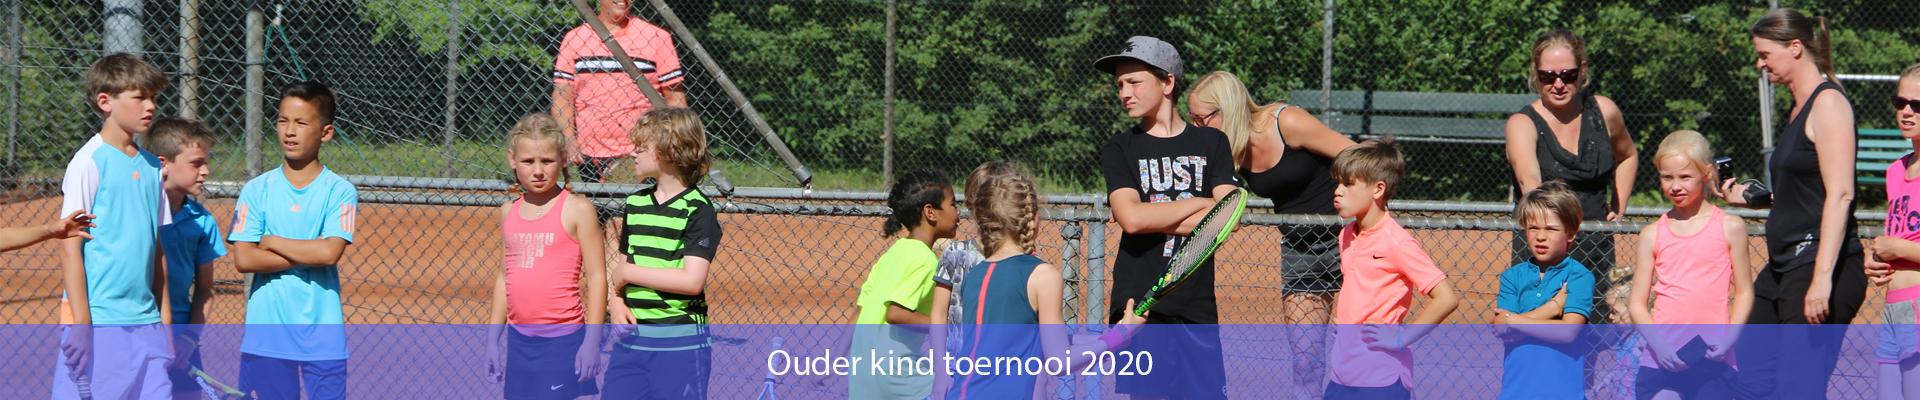 Ouder kind toernooi 2020